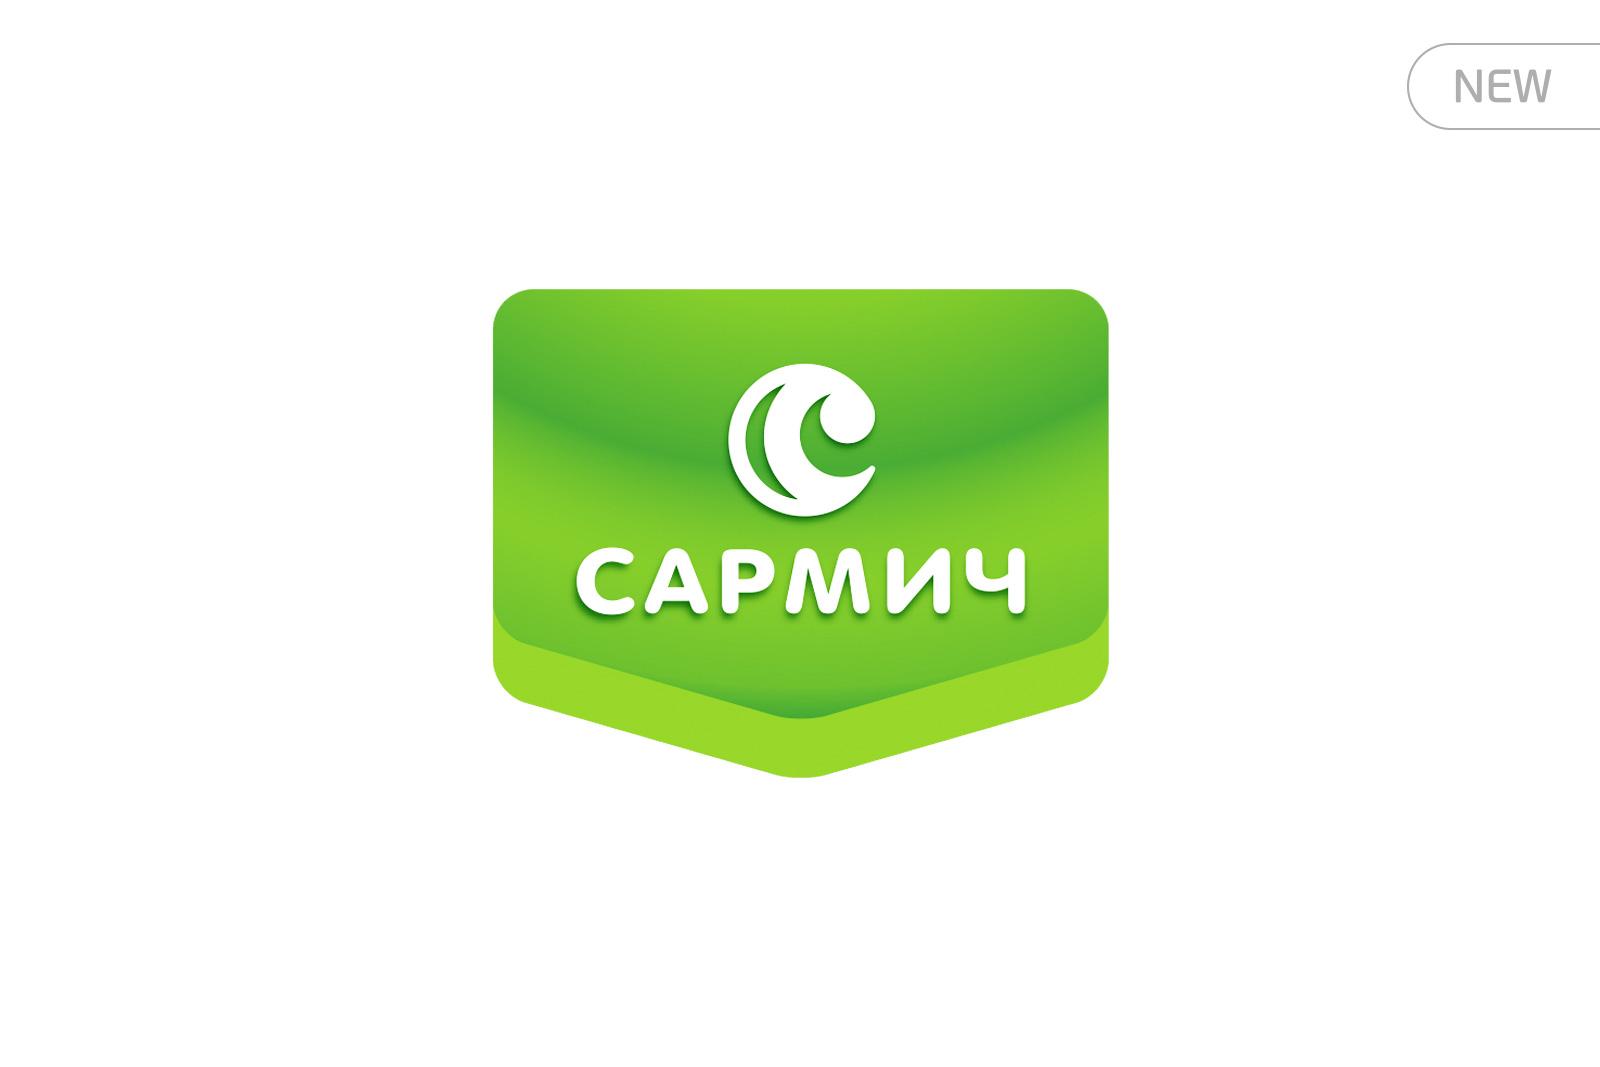 Asgard Branding, Sarmich, naming, package design, graphic design, Cheese factory, trademark, logo, C logo